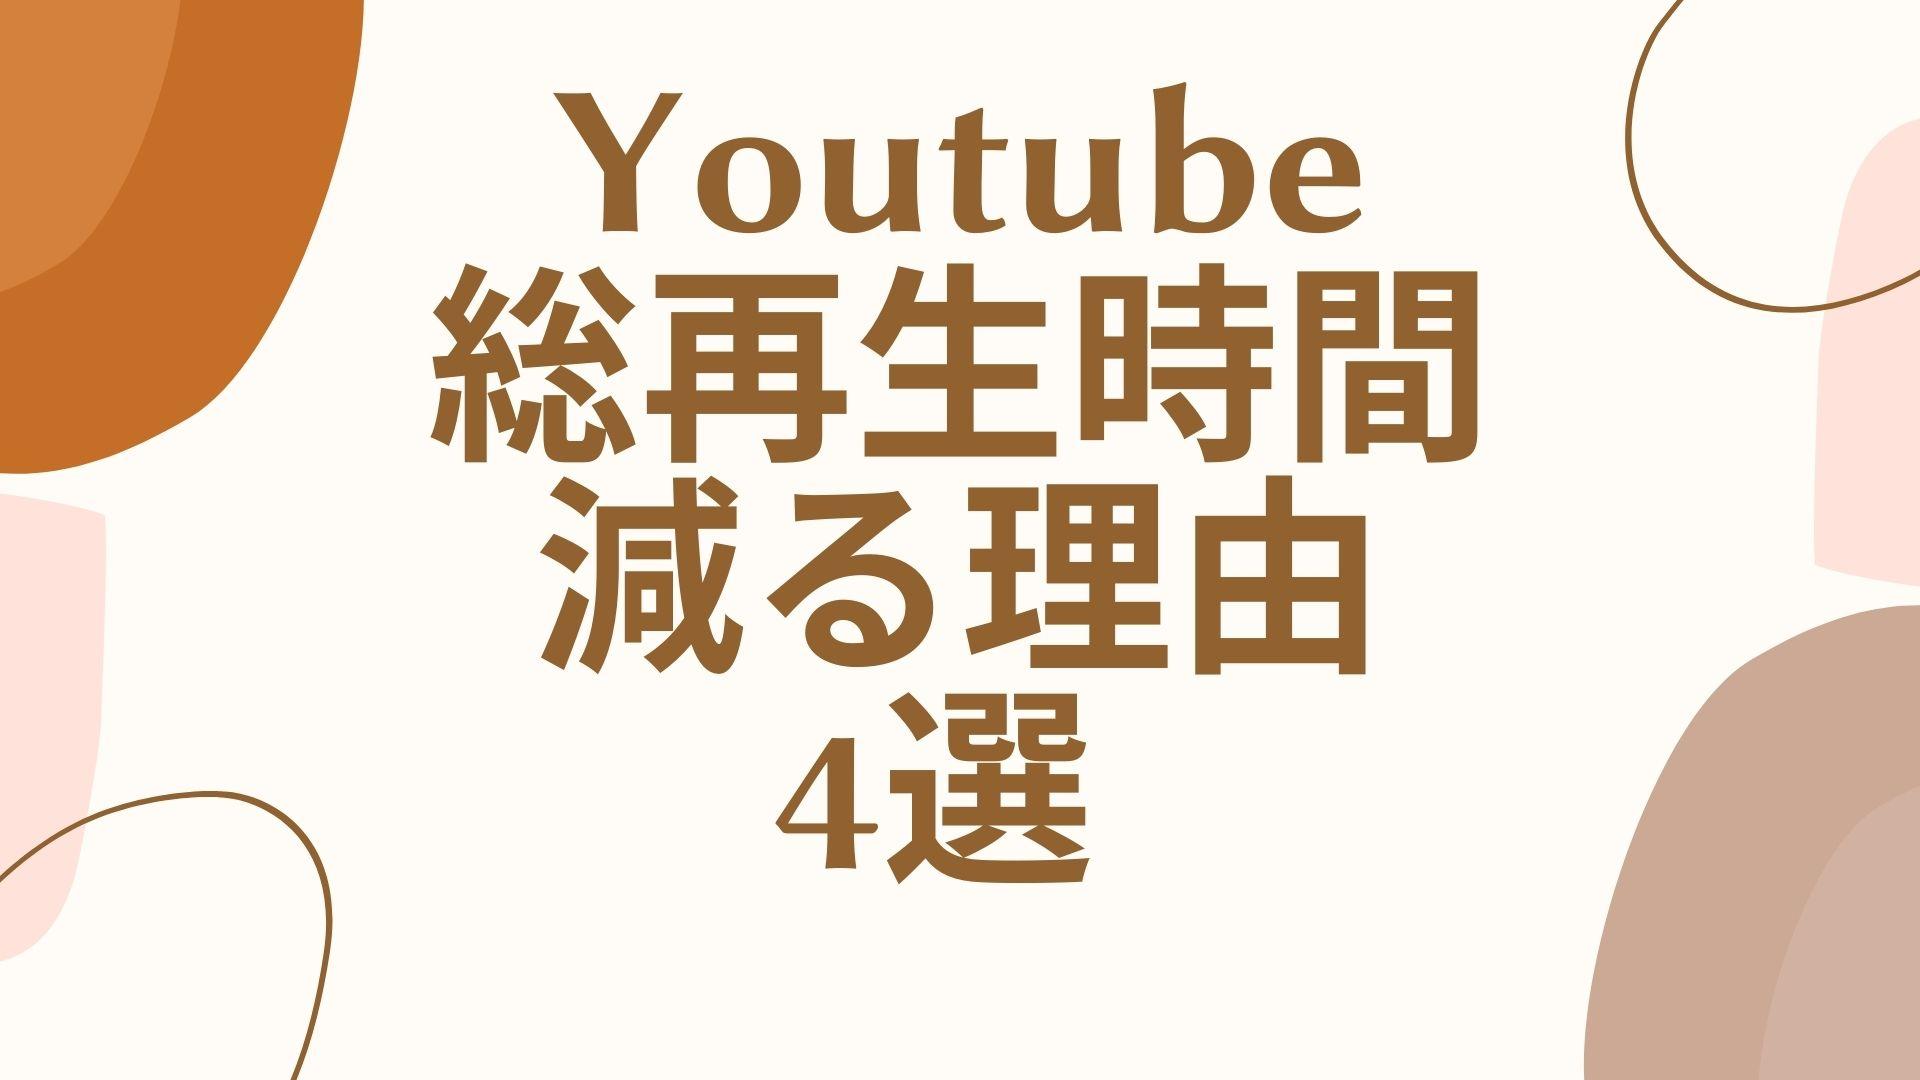 Youtubeの総再生時間が減る理由4選!